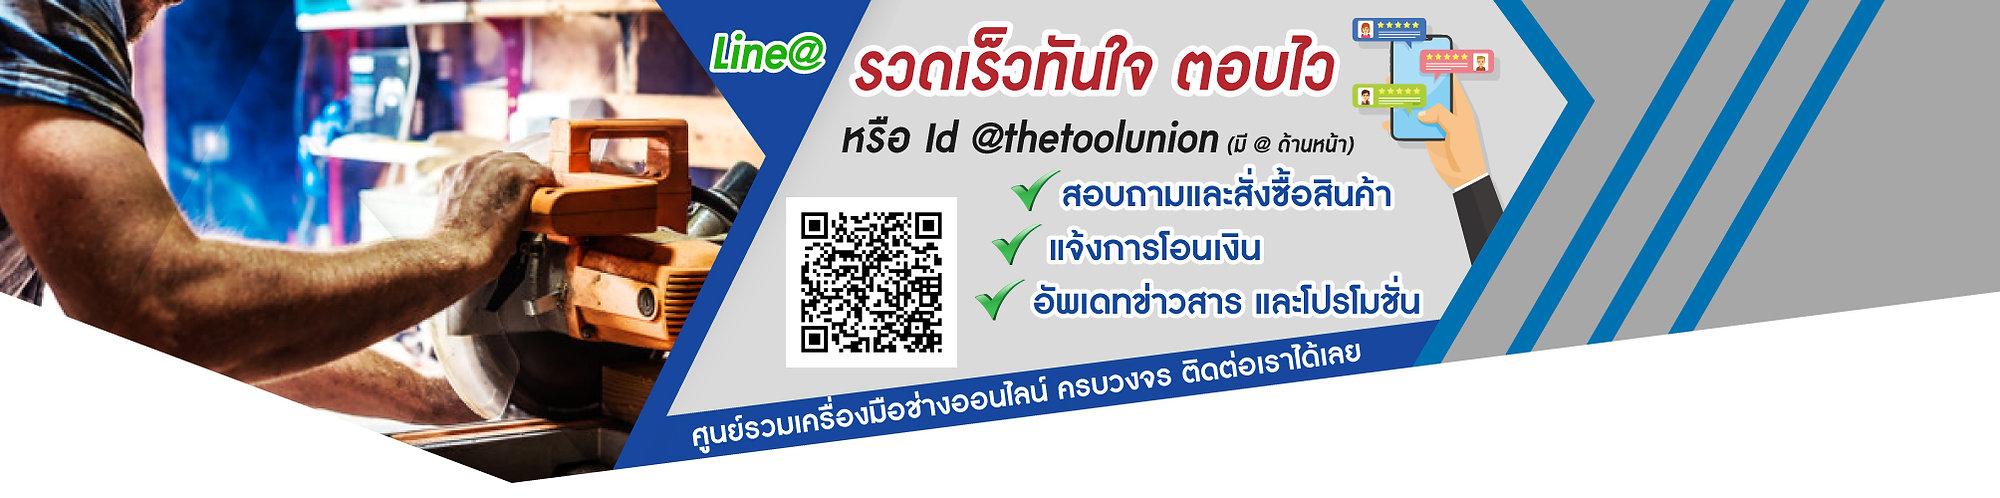 banner_contack.jpg